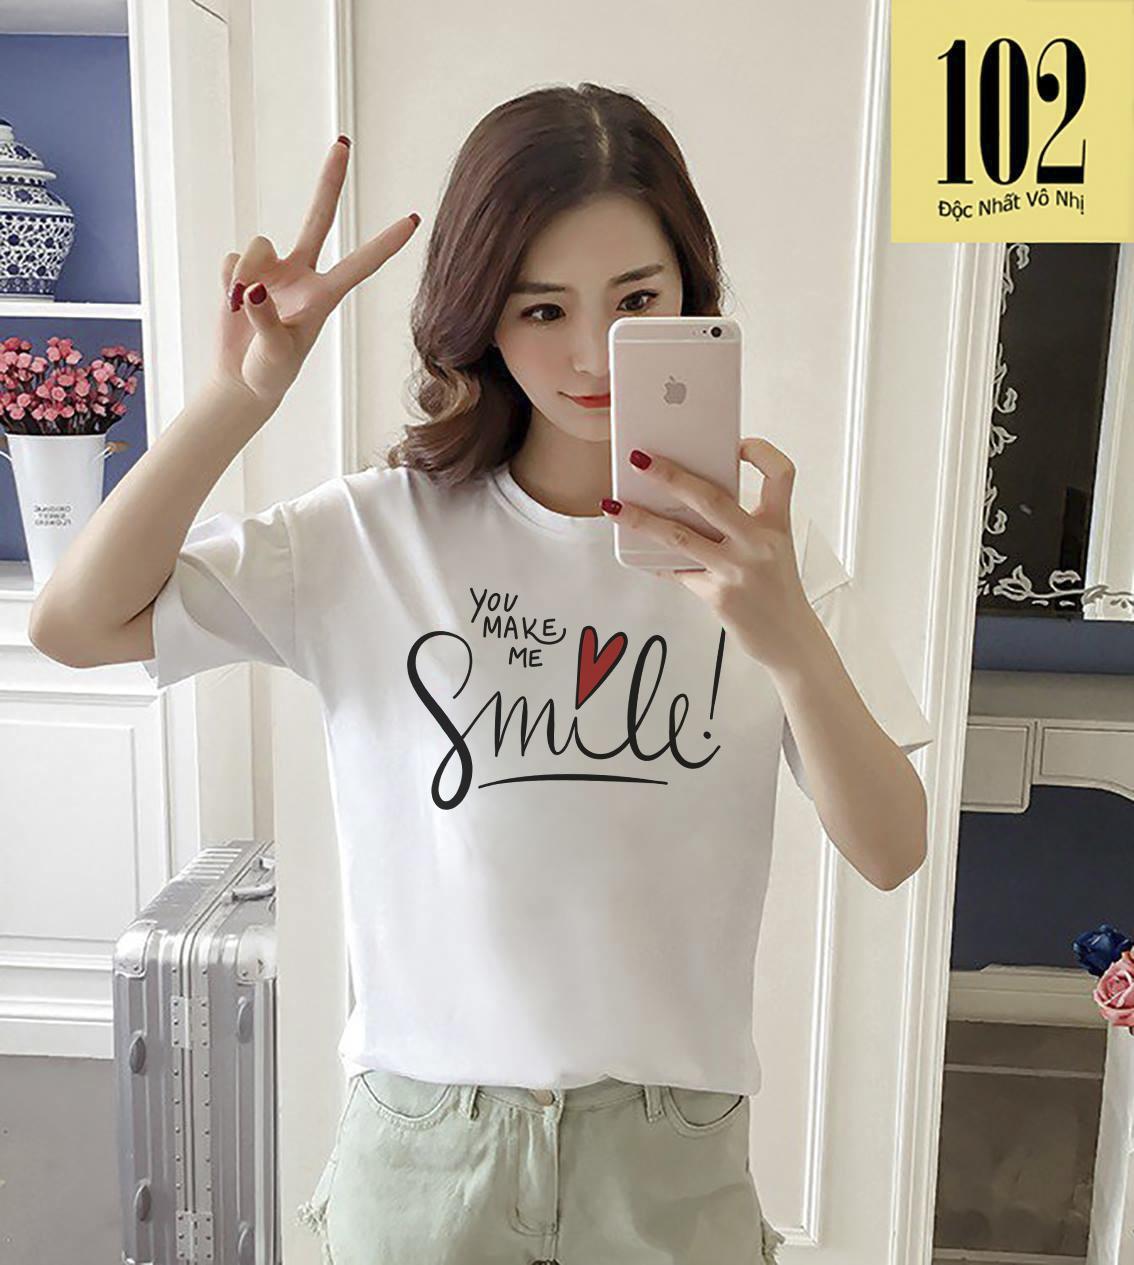 AO THUN NU YOU MAKE ME SMILE ATNK960 Form Rong Han quoc AoThun102